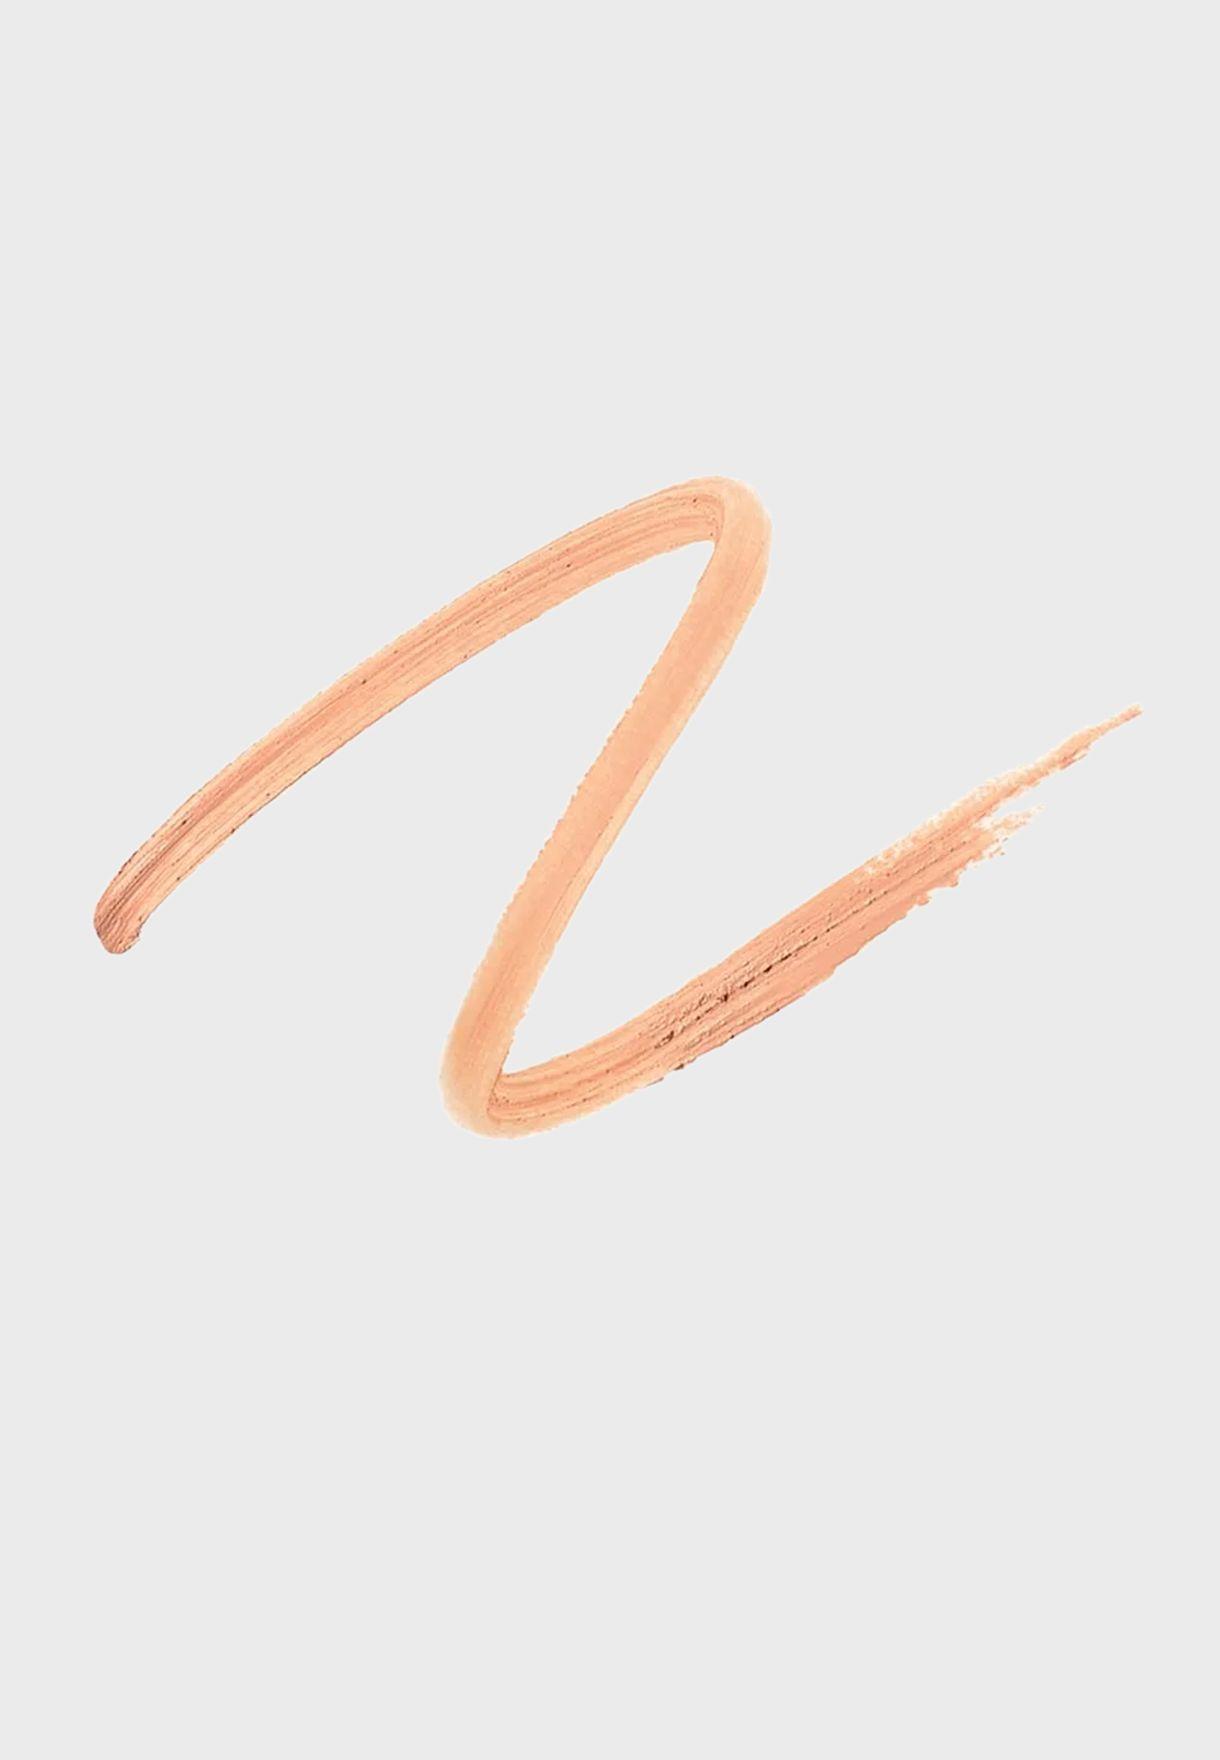 Roller Eye Brightening Pencil